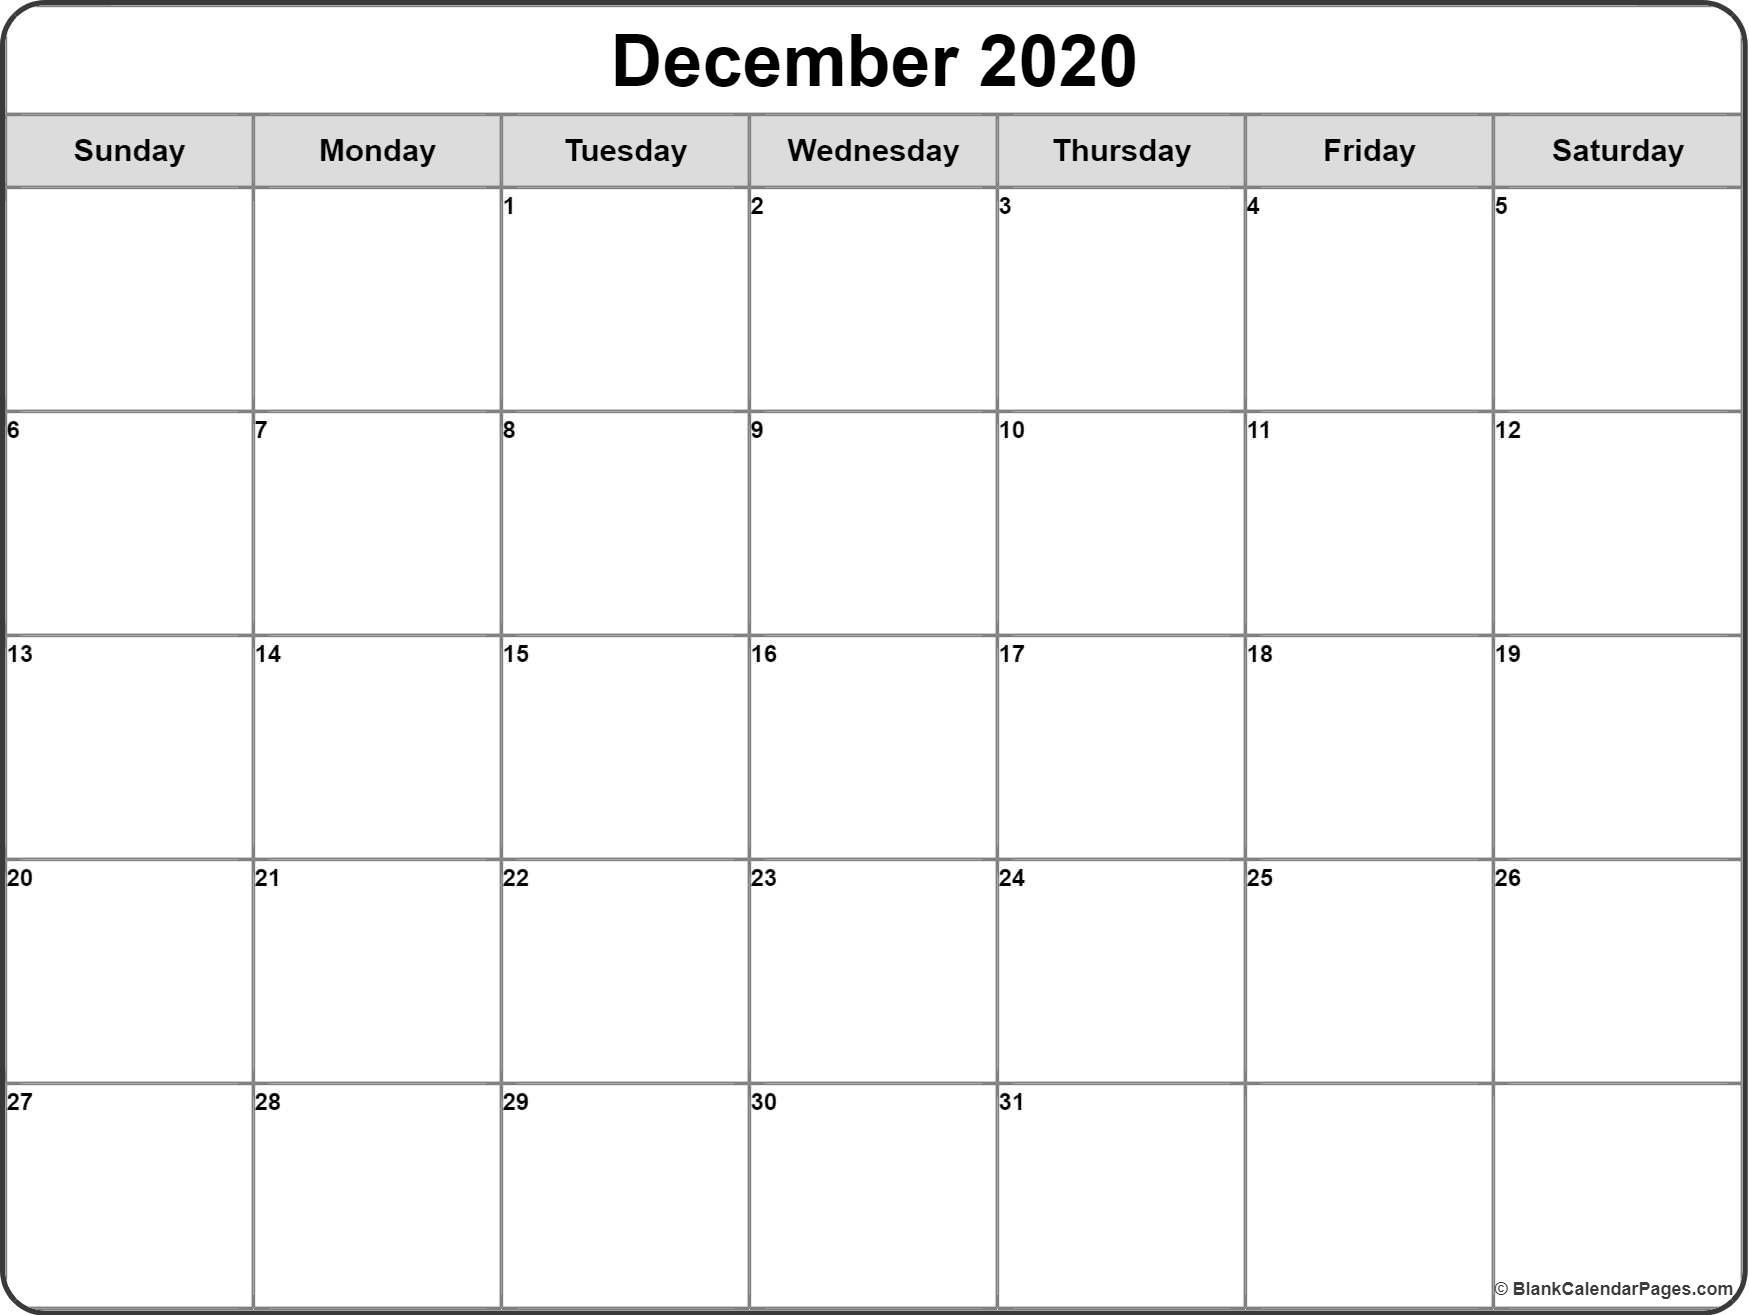 December 2020 Calendar   Free Printable Monthly Calendars within Printable Calendar 2020 Monthly Free